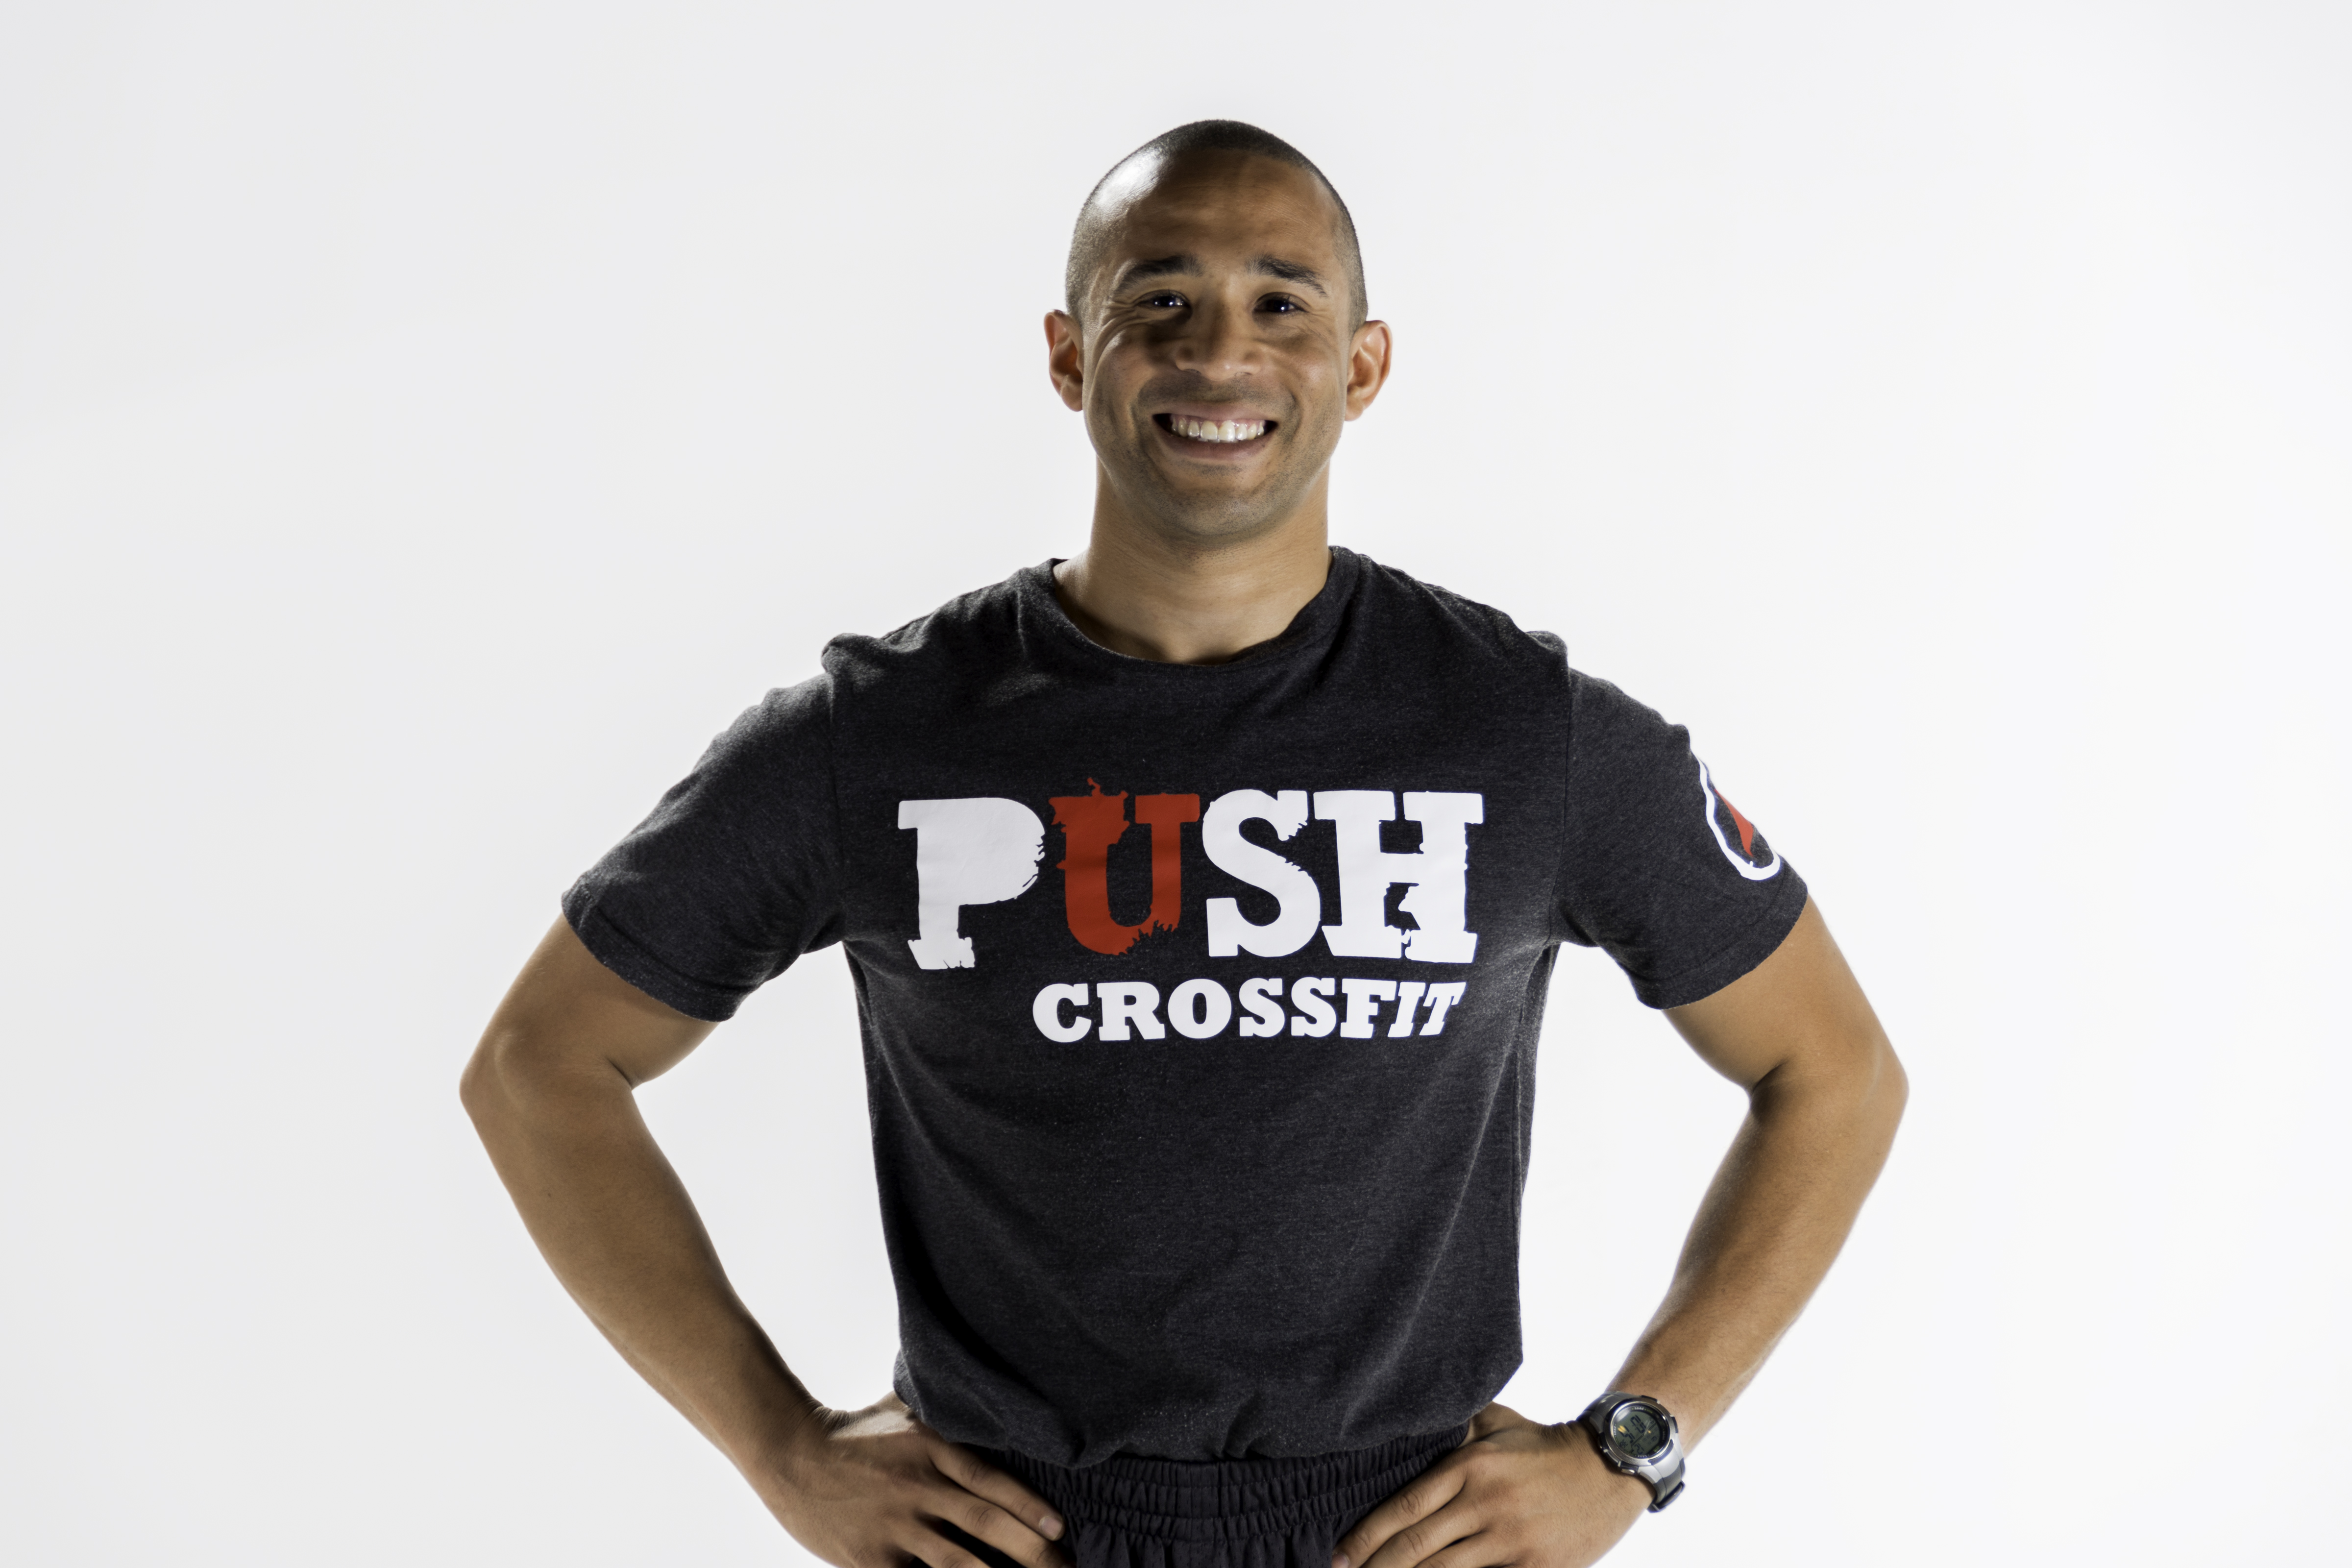 Push Crossfit